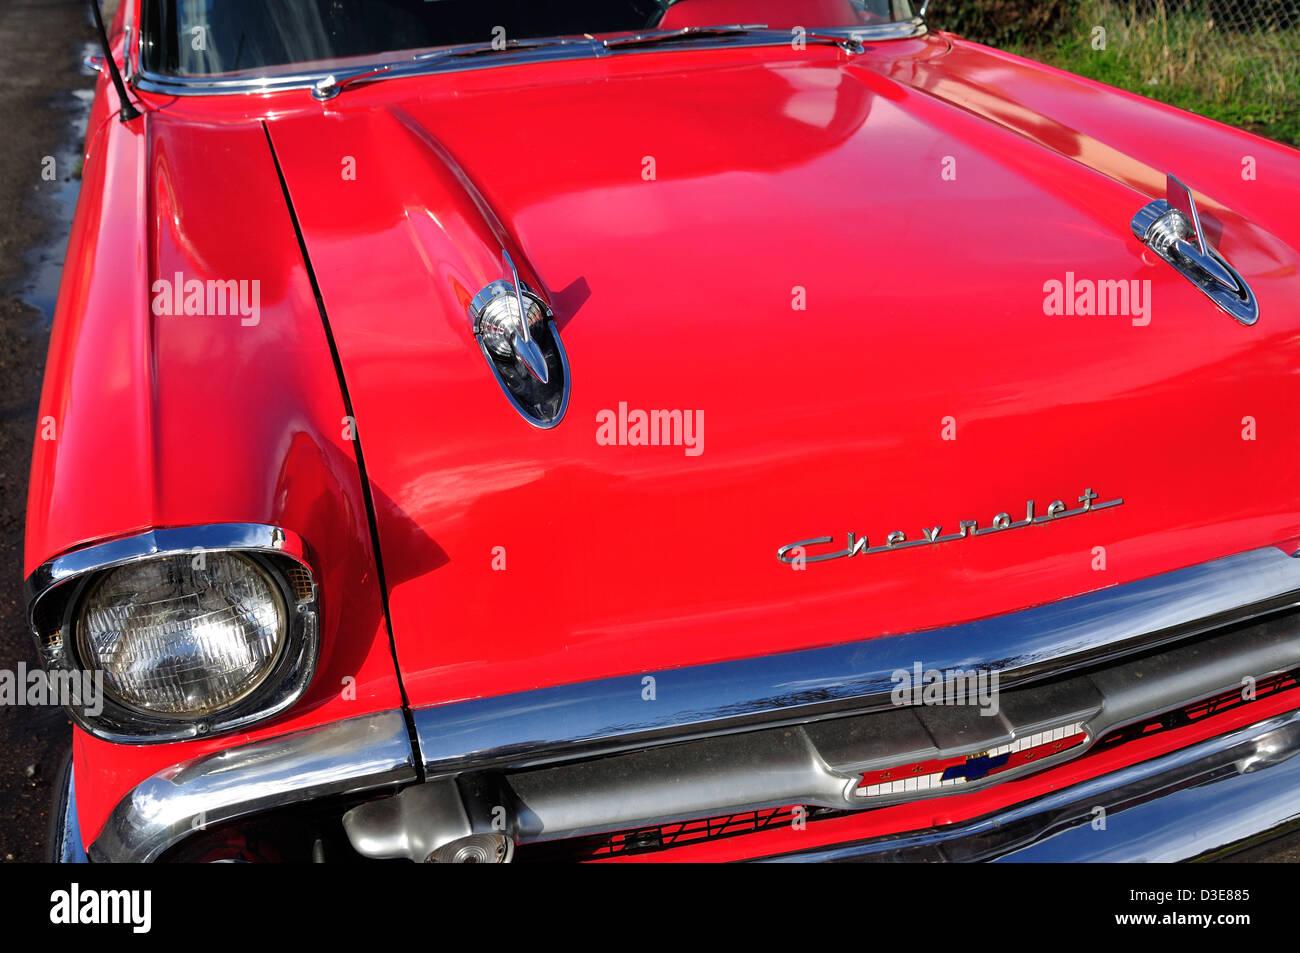 Classic 1957 Chevrolet Bel Air Sedan, Stanwell Moor, Borough of Spelthorne, Surrey, Inglaterra, Reino Unido Imagen De Stock